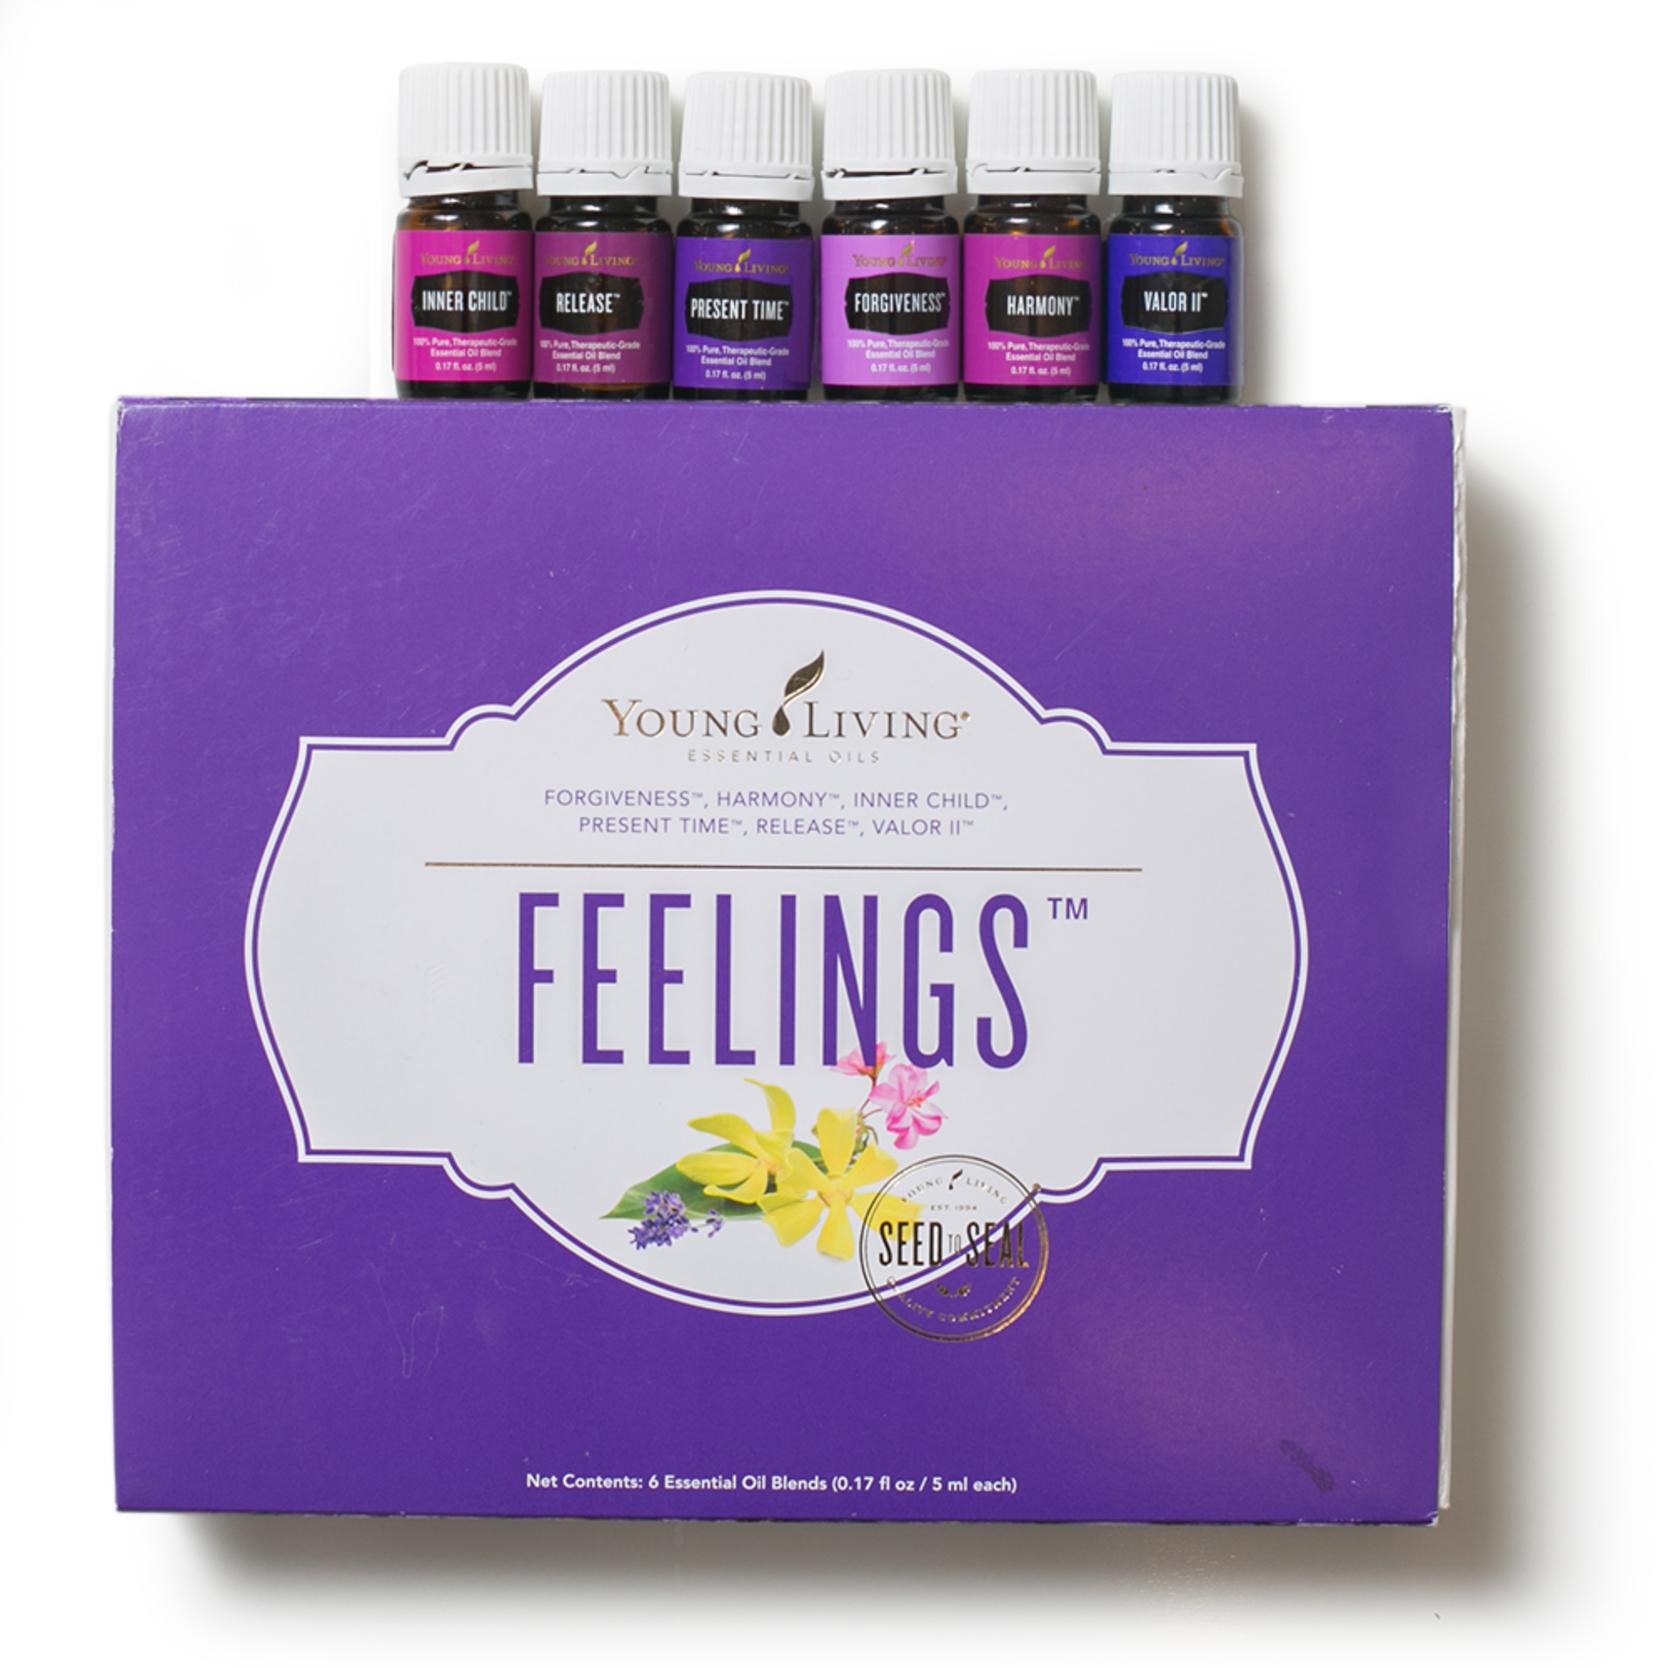 Feelings Kit